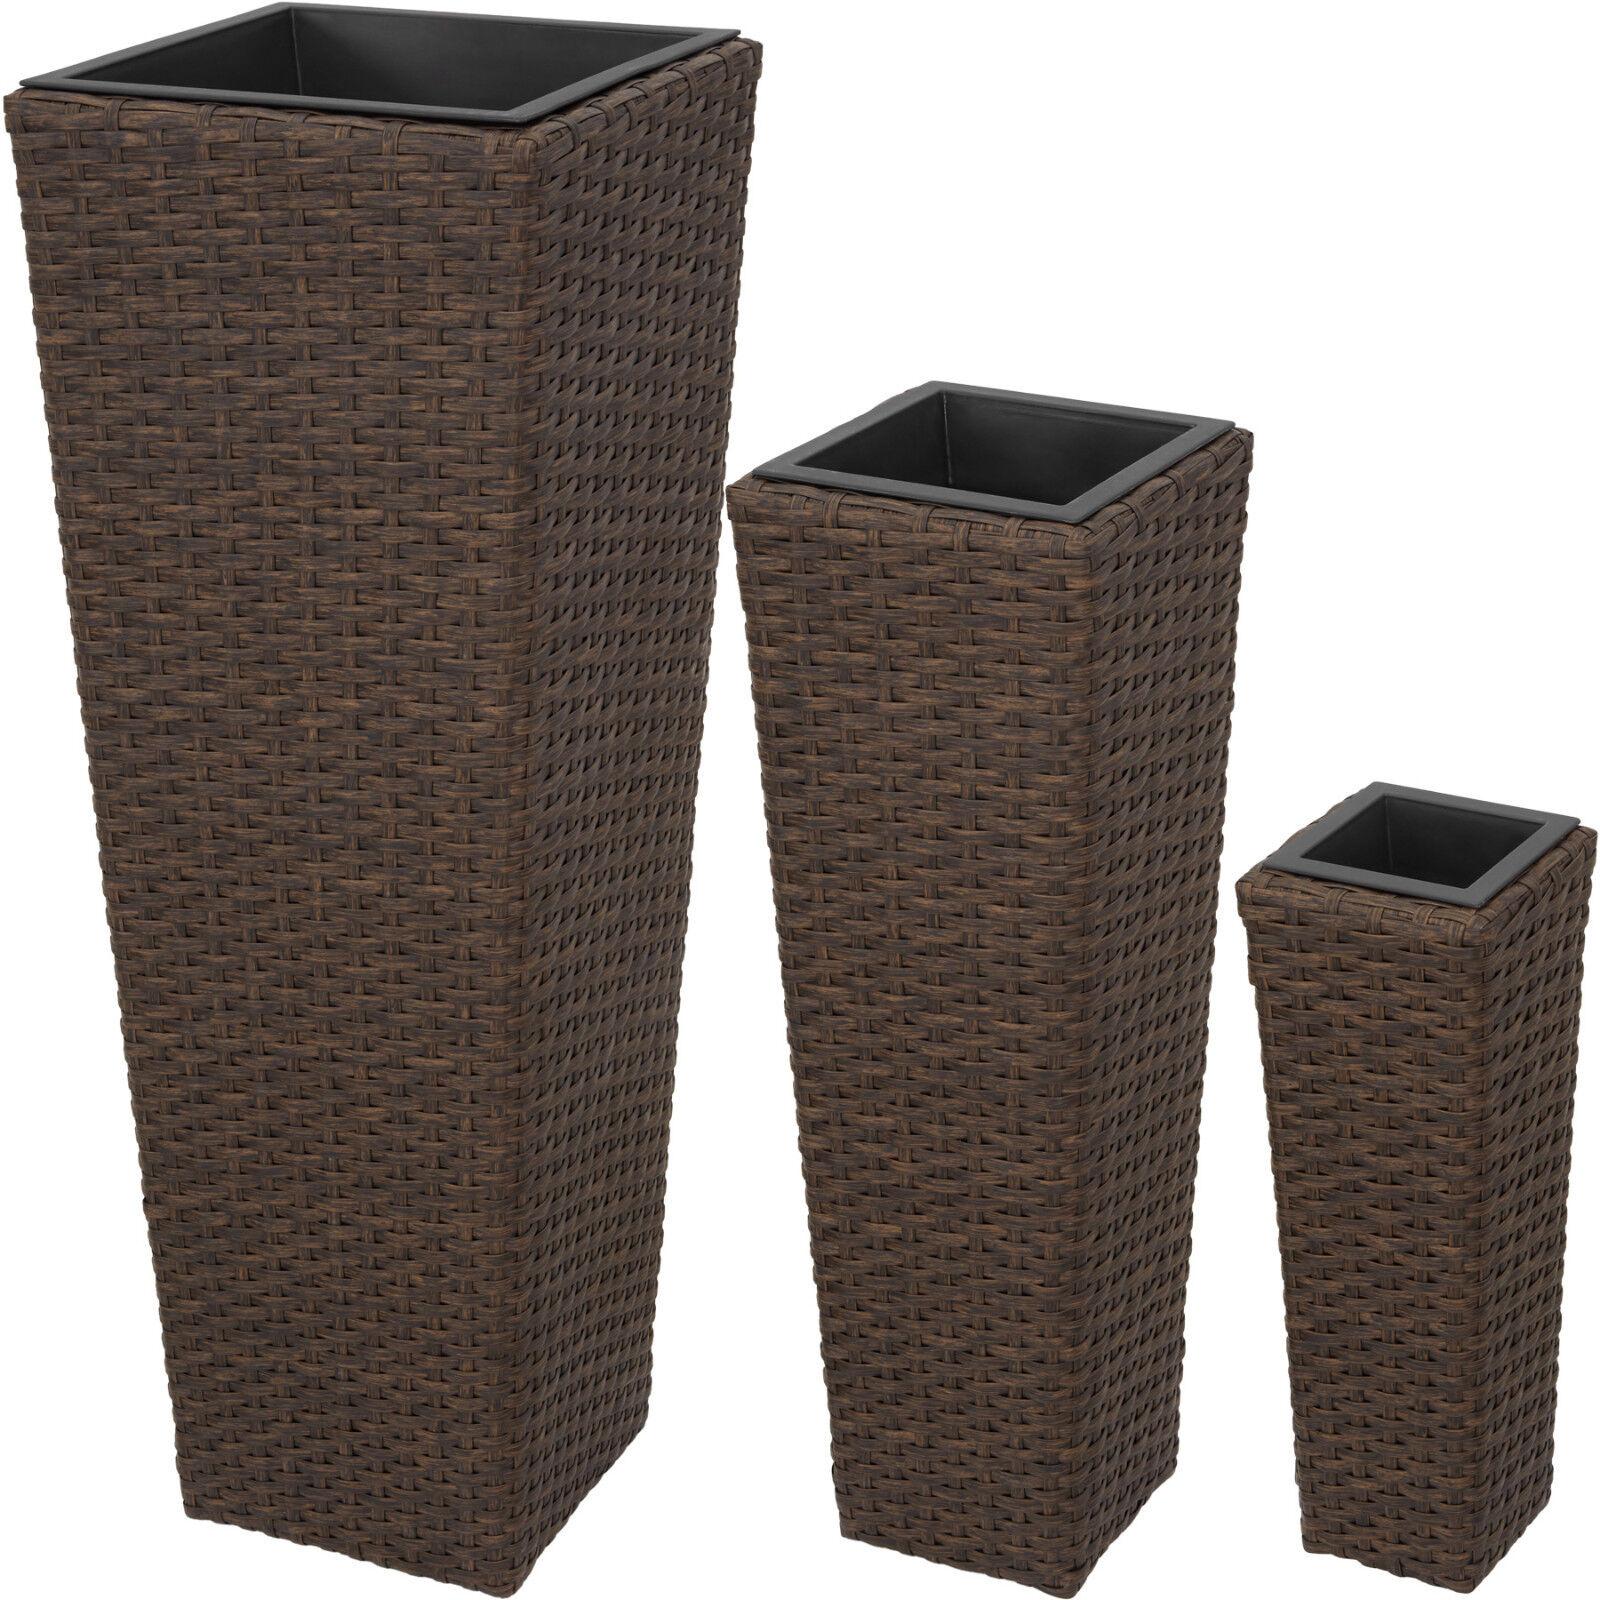 Set di 3 vasi polyrattan giardino casa balcone arrojoo rattan vaso fiori antico